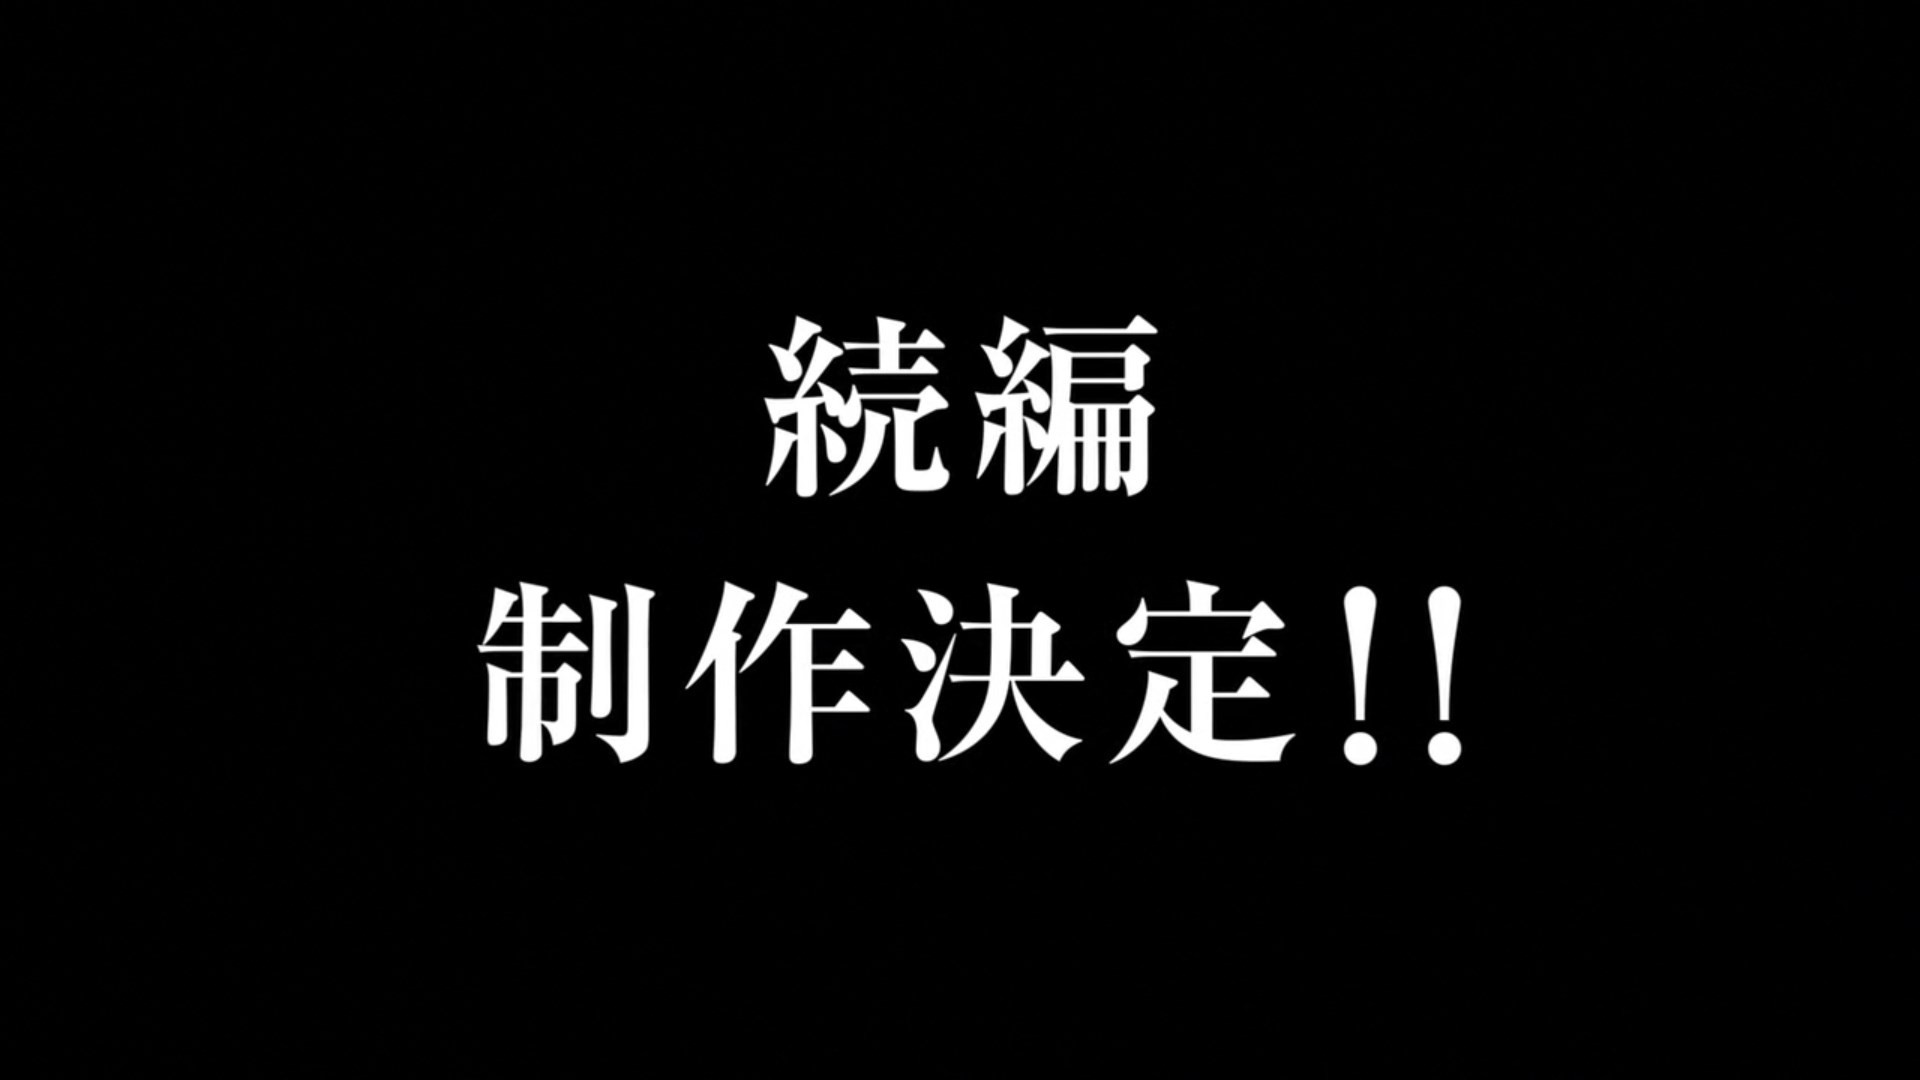 SnapCrab_NoName_2015-3-27_2-13-23_No-00